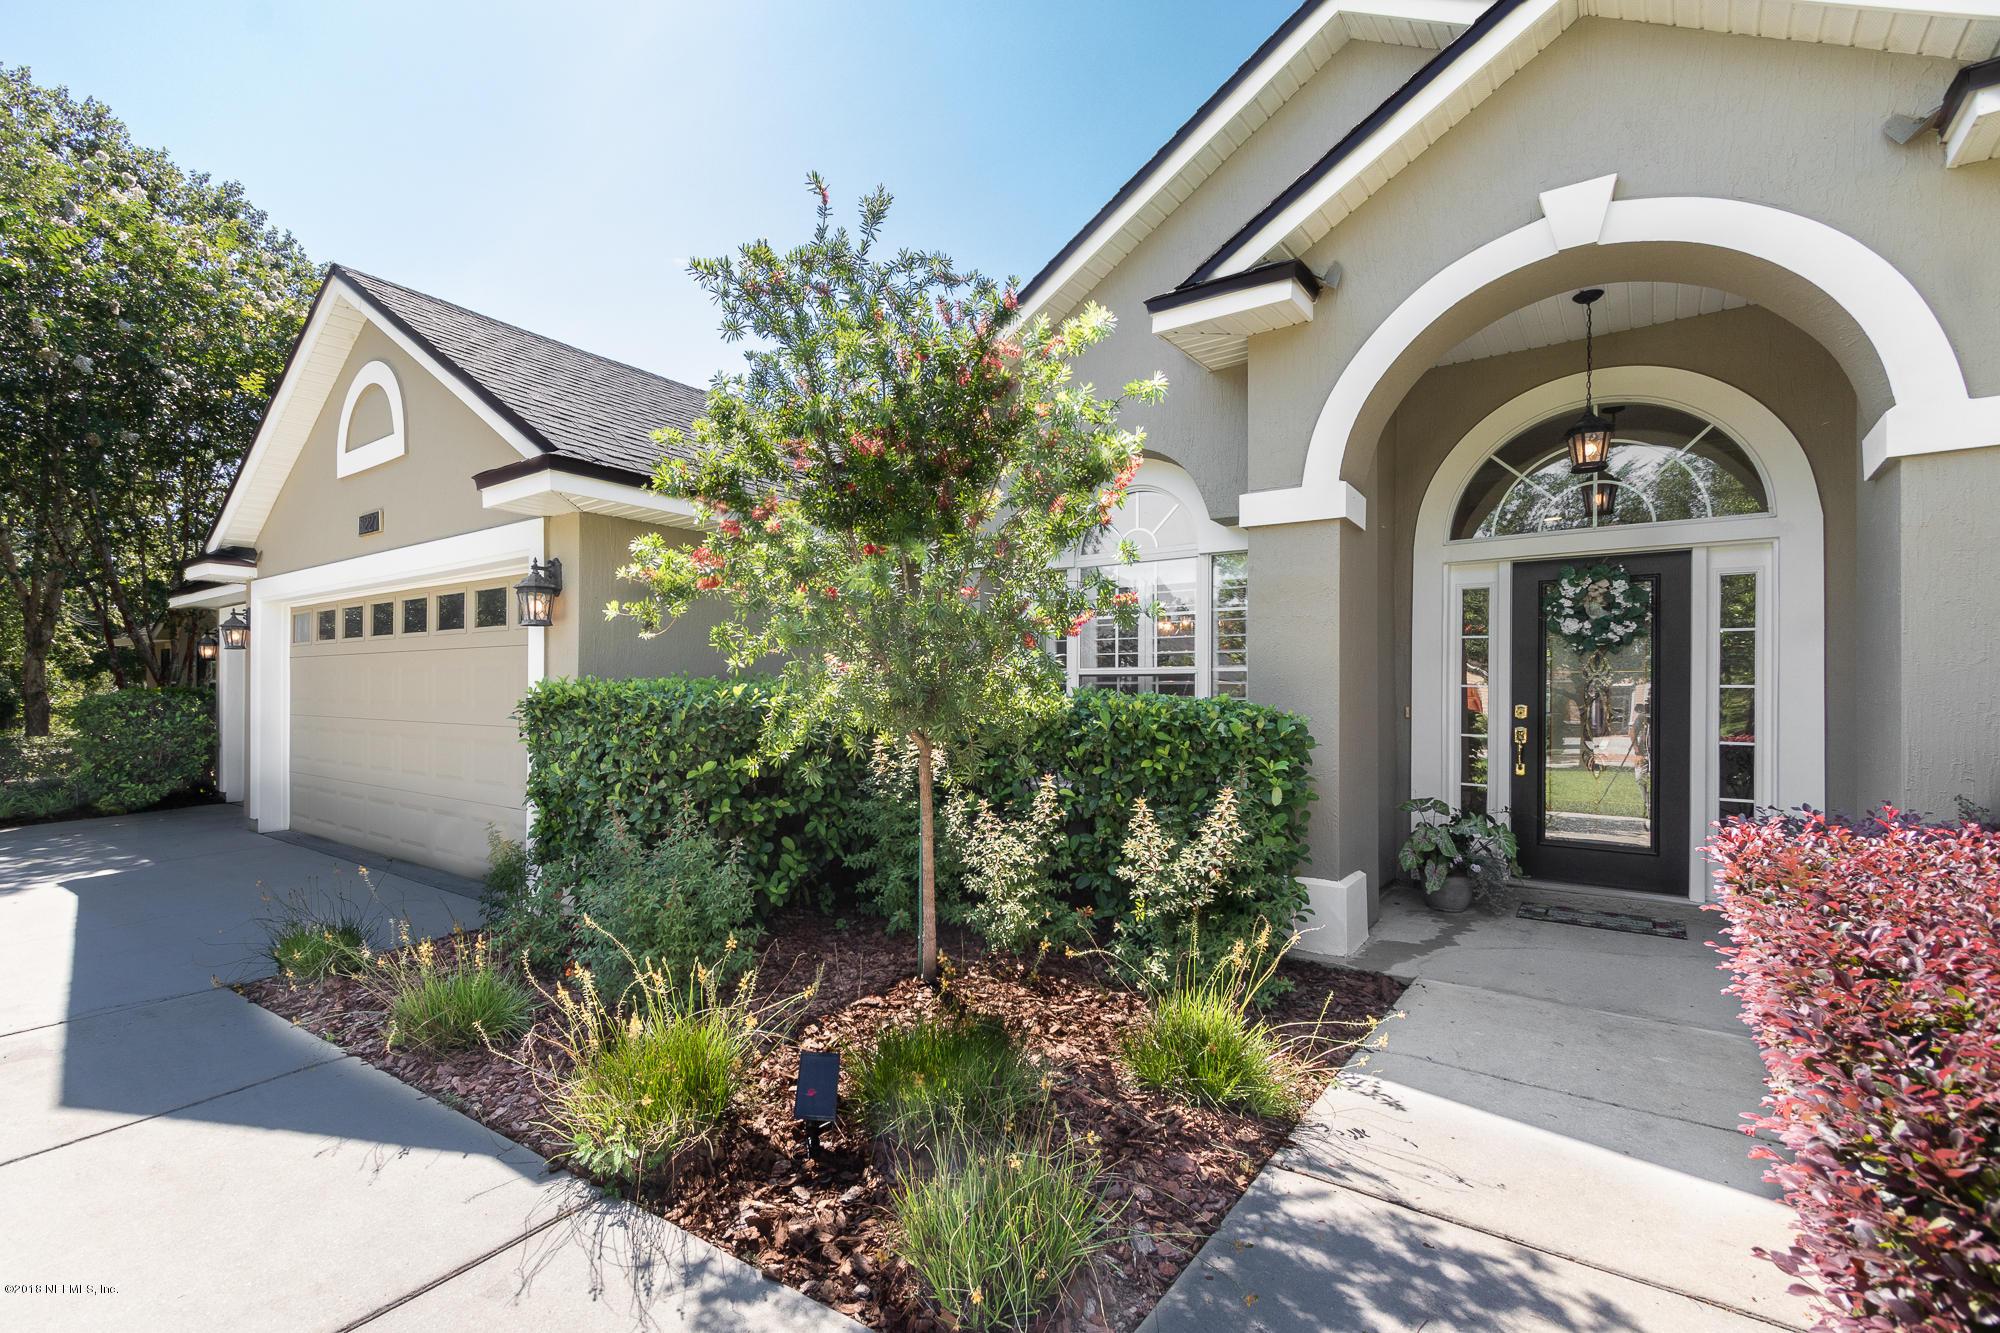 5227 COMFORT, ST AUGUSTINE, FLORIDA 32092, 4 Bedrooms Bedrooms, ,3 BathroomsBathrooms,Residential - single family,For sale,COMFORT,946952